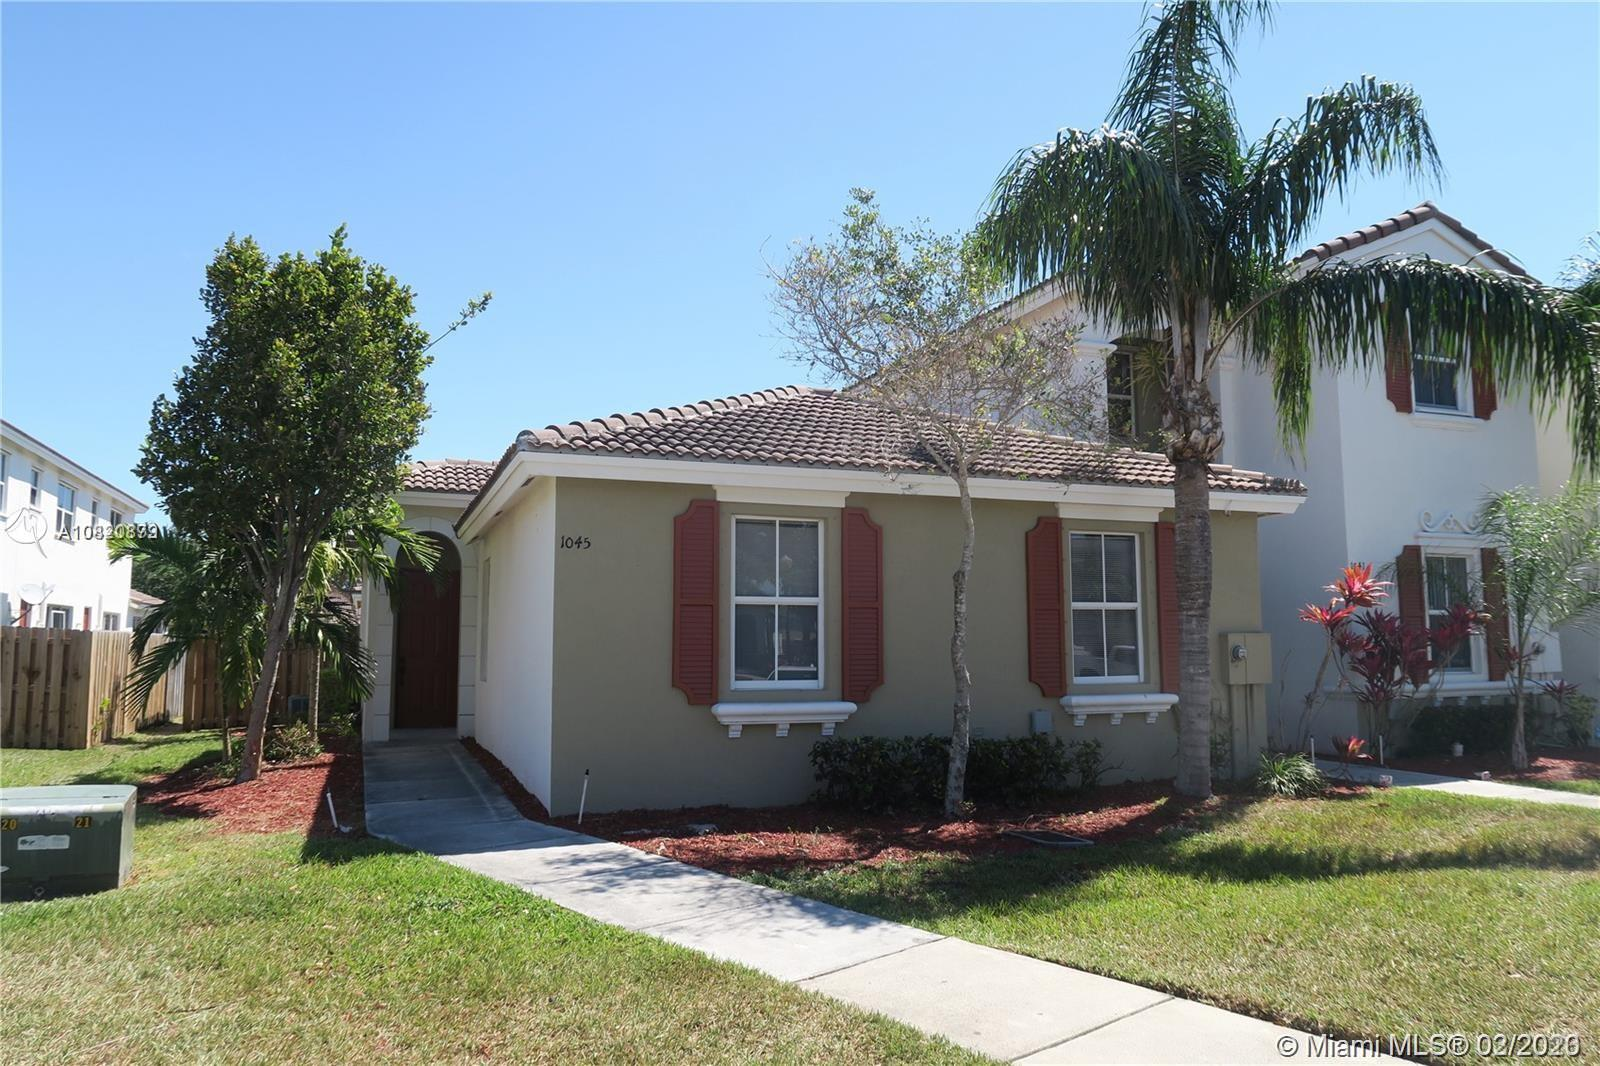 1045 NE 42nd Ter, Homestead, FL 33033 - Homestead, FL real estate listing